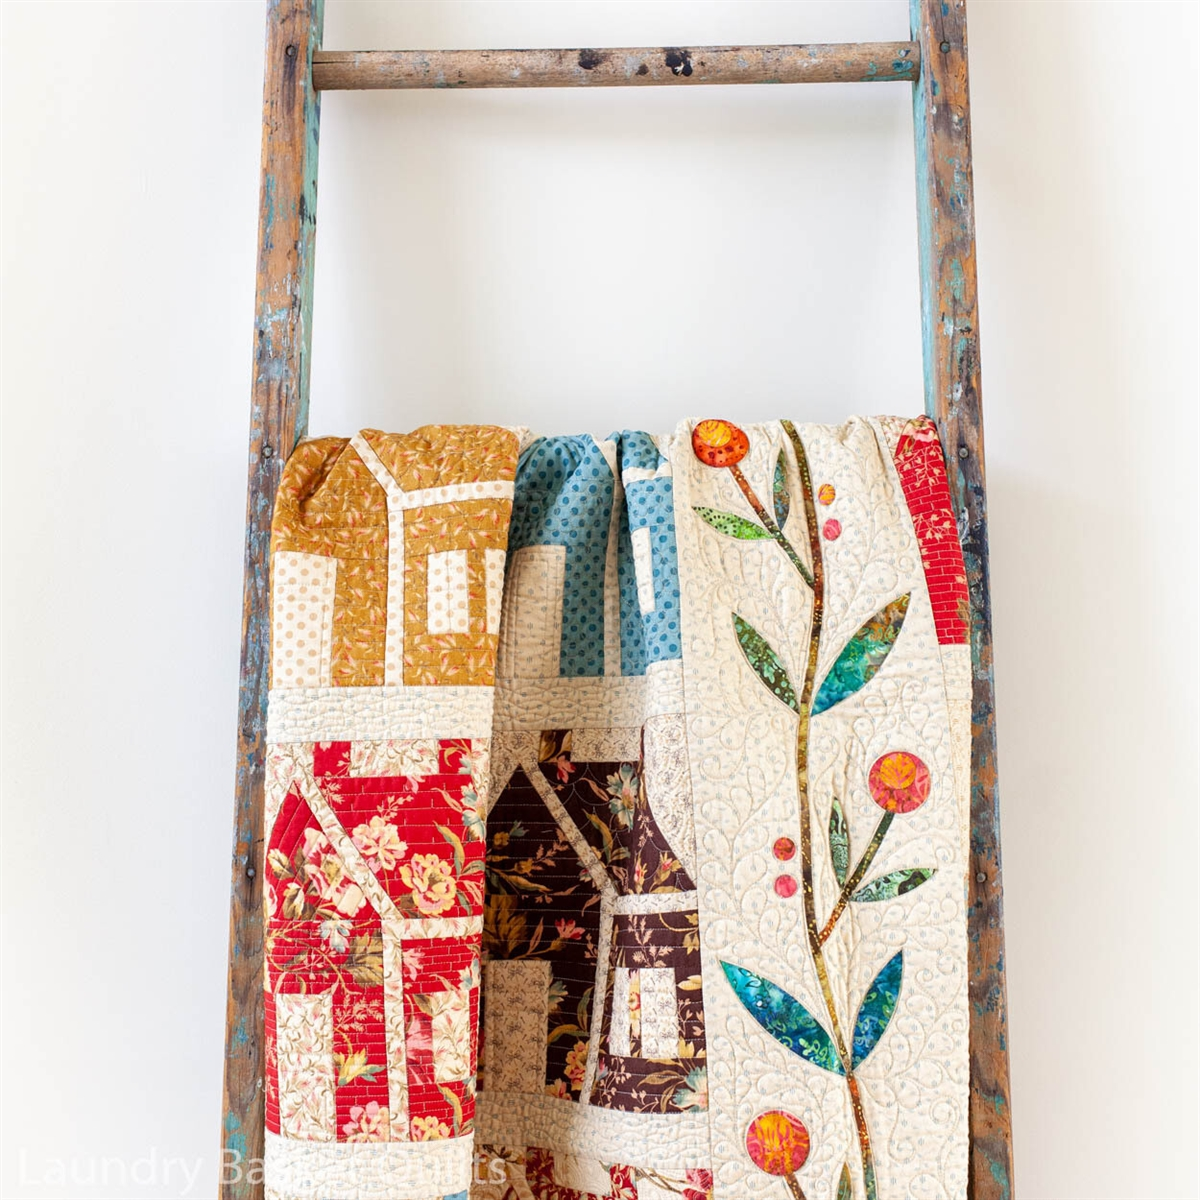 Homestead House Quilt pattern by Edyta Sitar, Laundry Basket Quilts : edyta sitar quilt patterns - Adamdwight.com